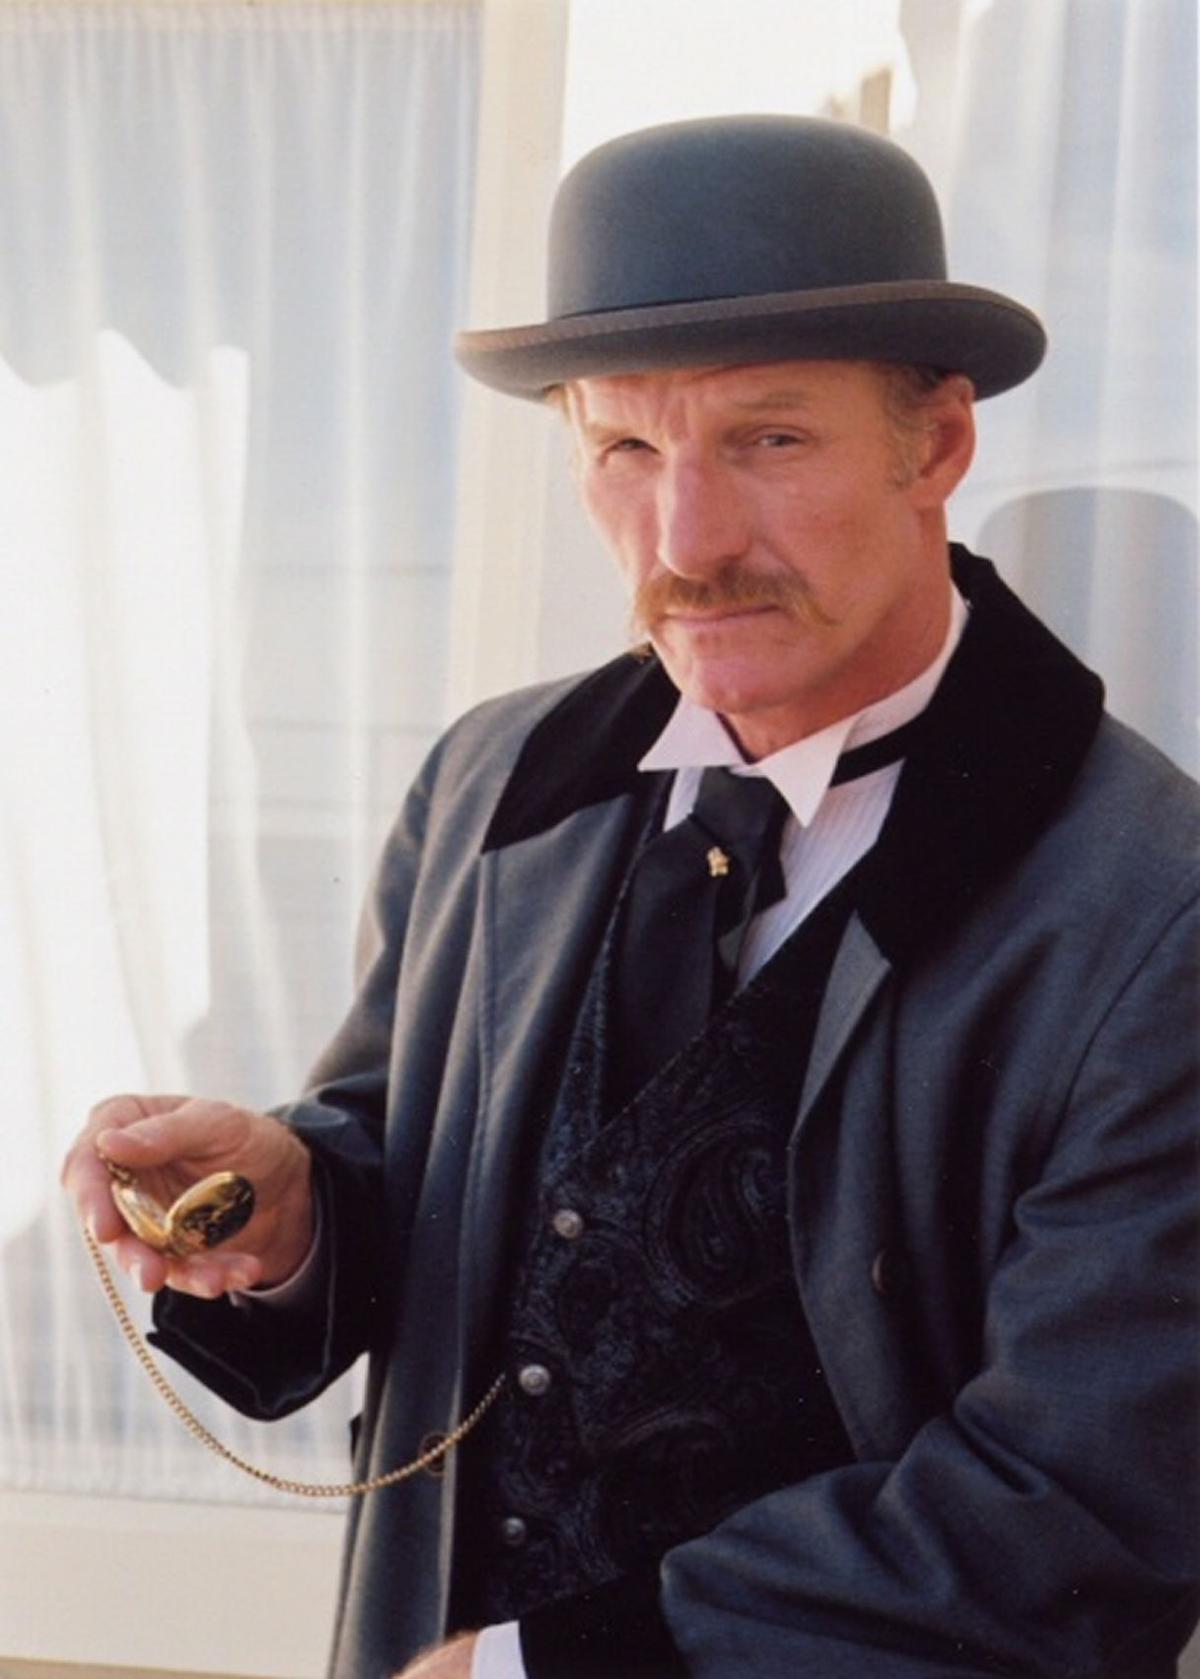 The Legendary Doc Holliday Wyatt Earp Reveals The Man